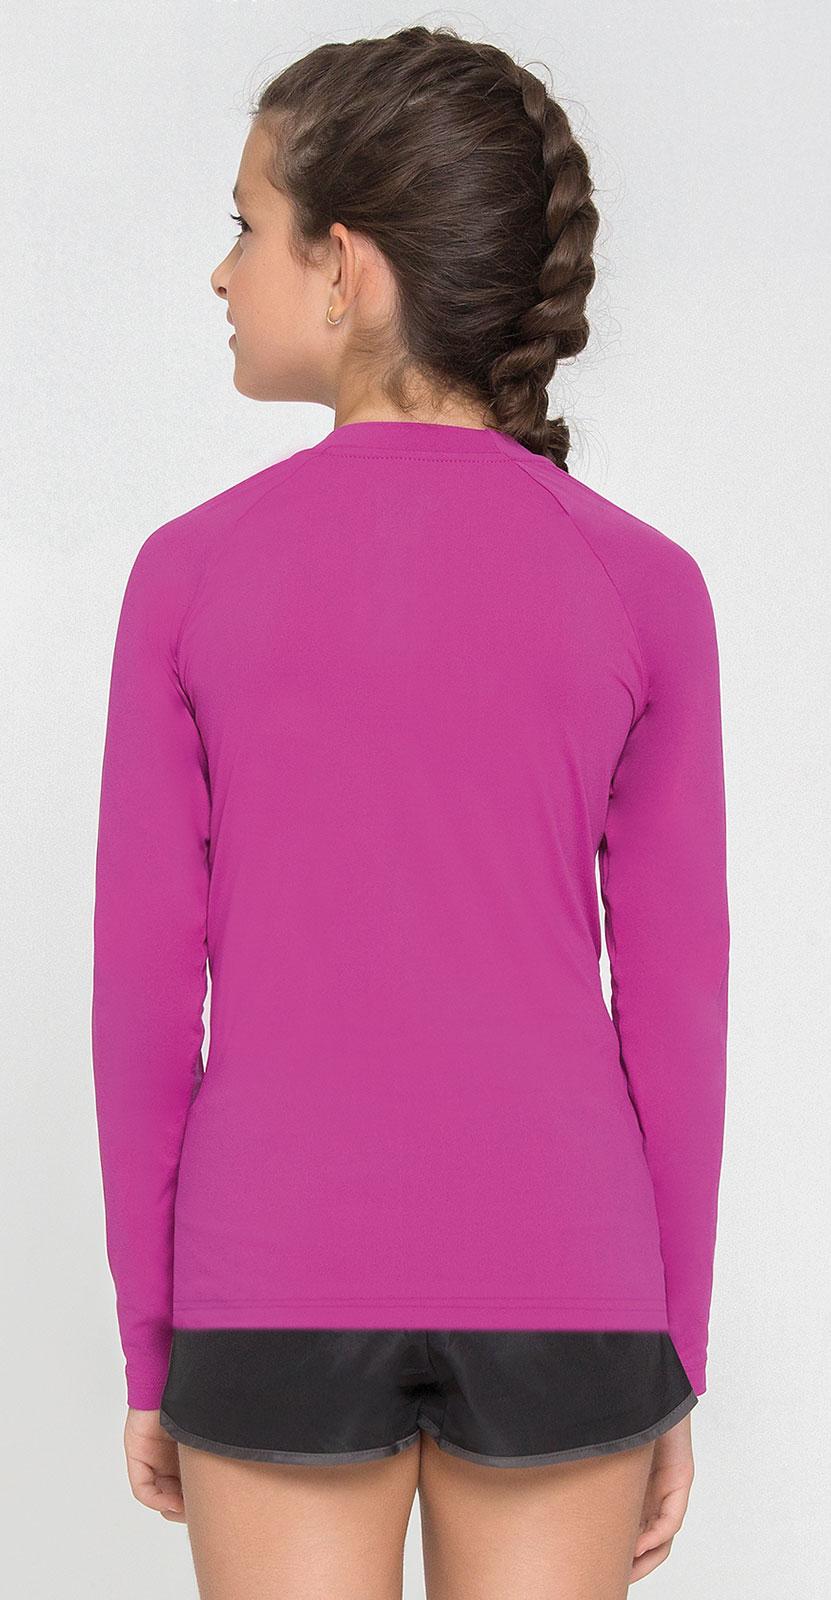 UV LINE Camiseta Uvpro Manga Longa Infantil Rosa Batom Proteção Solar